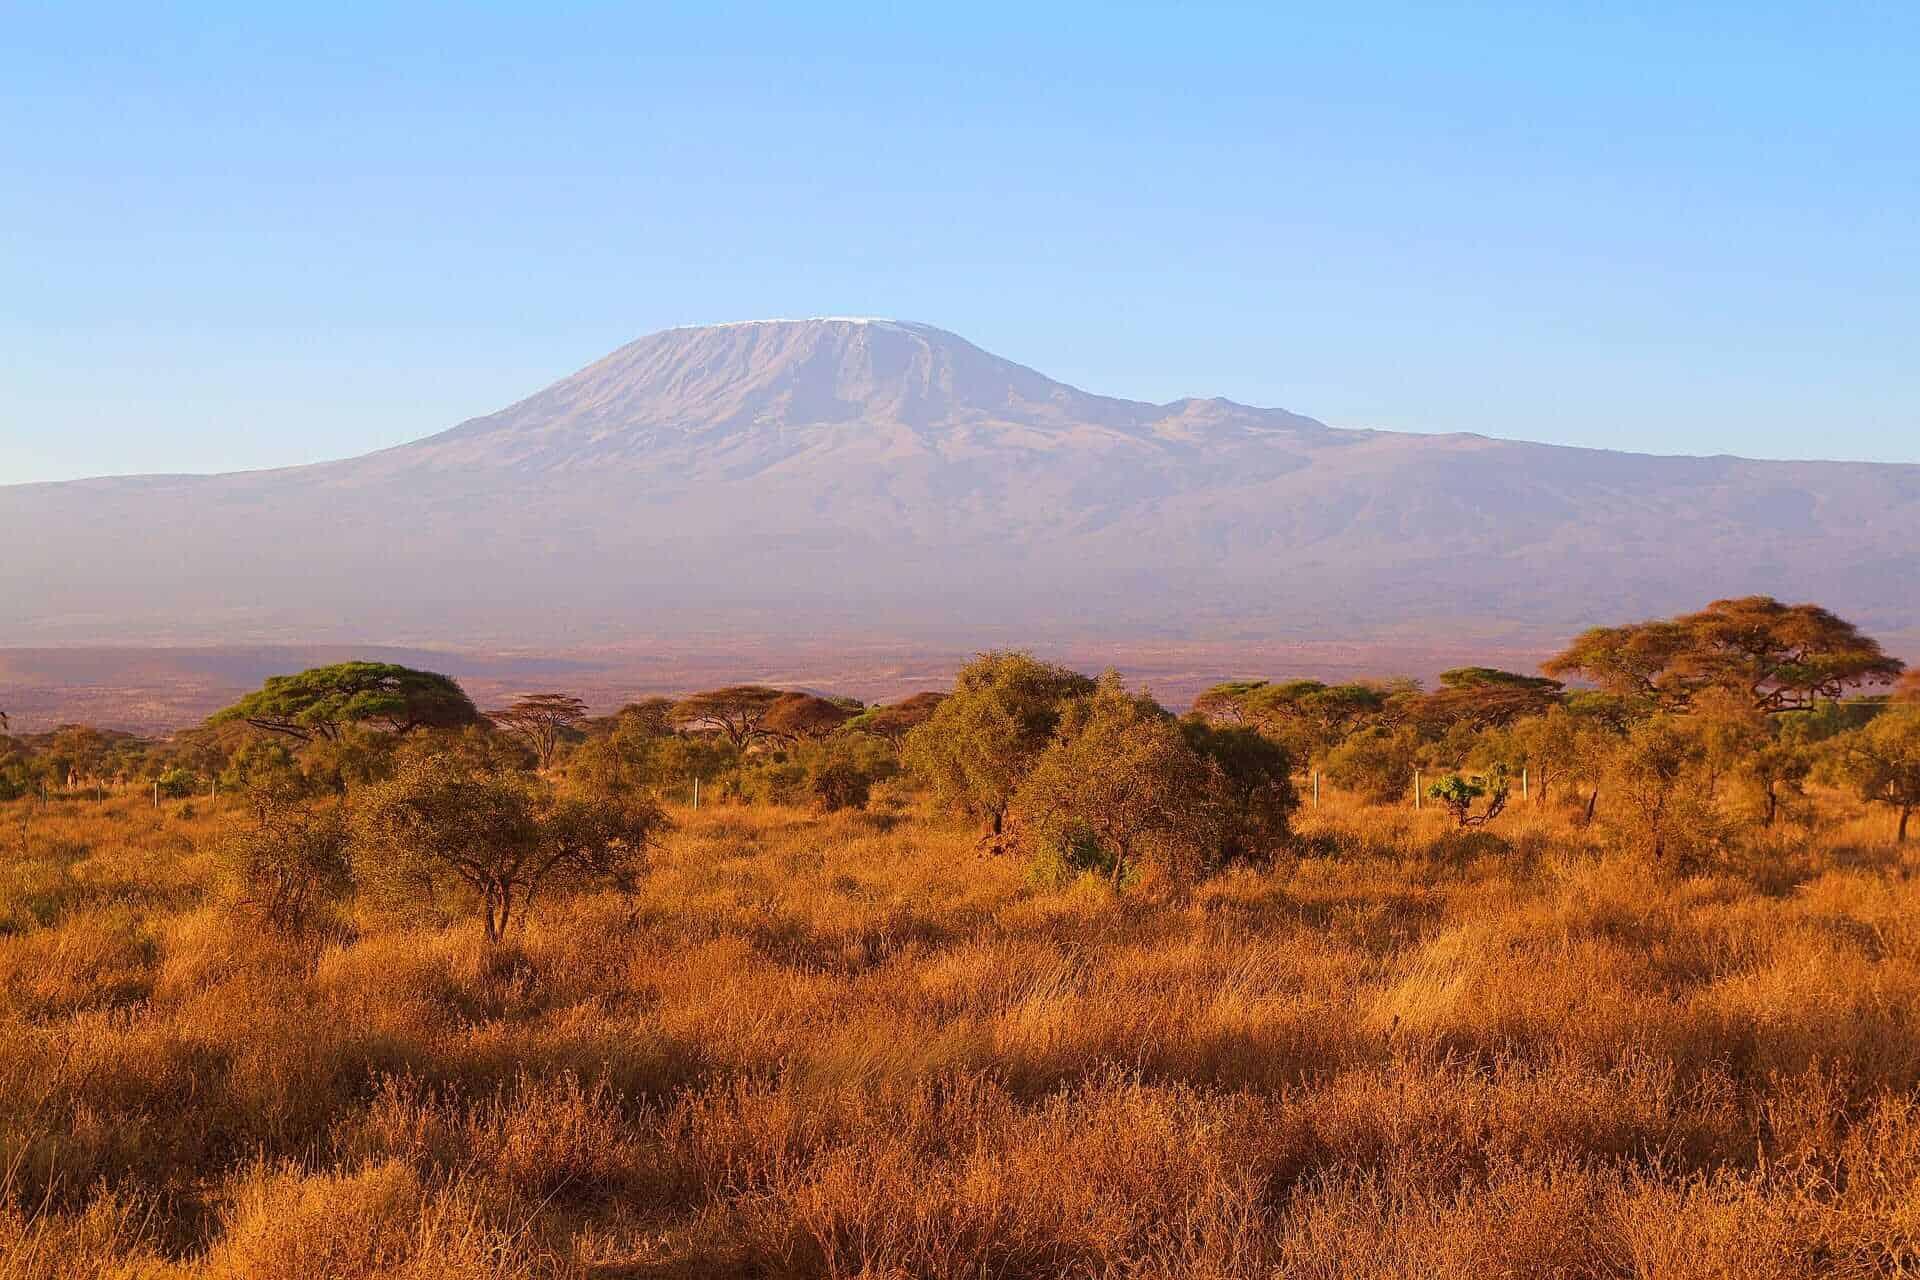 Kilimanjaro Mount, Tanzania